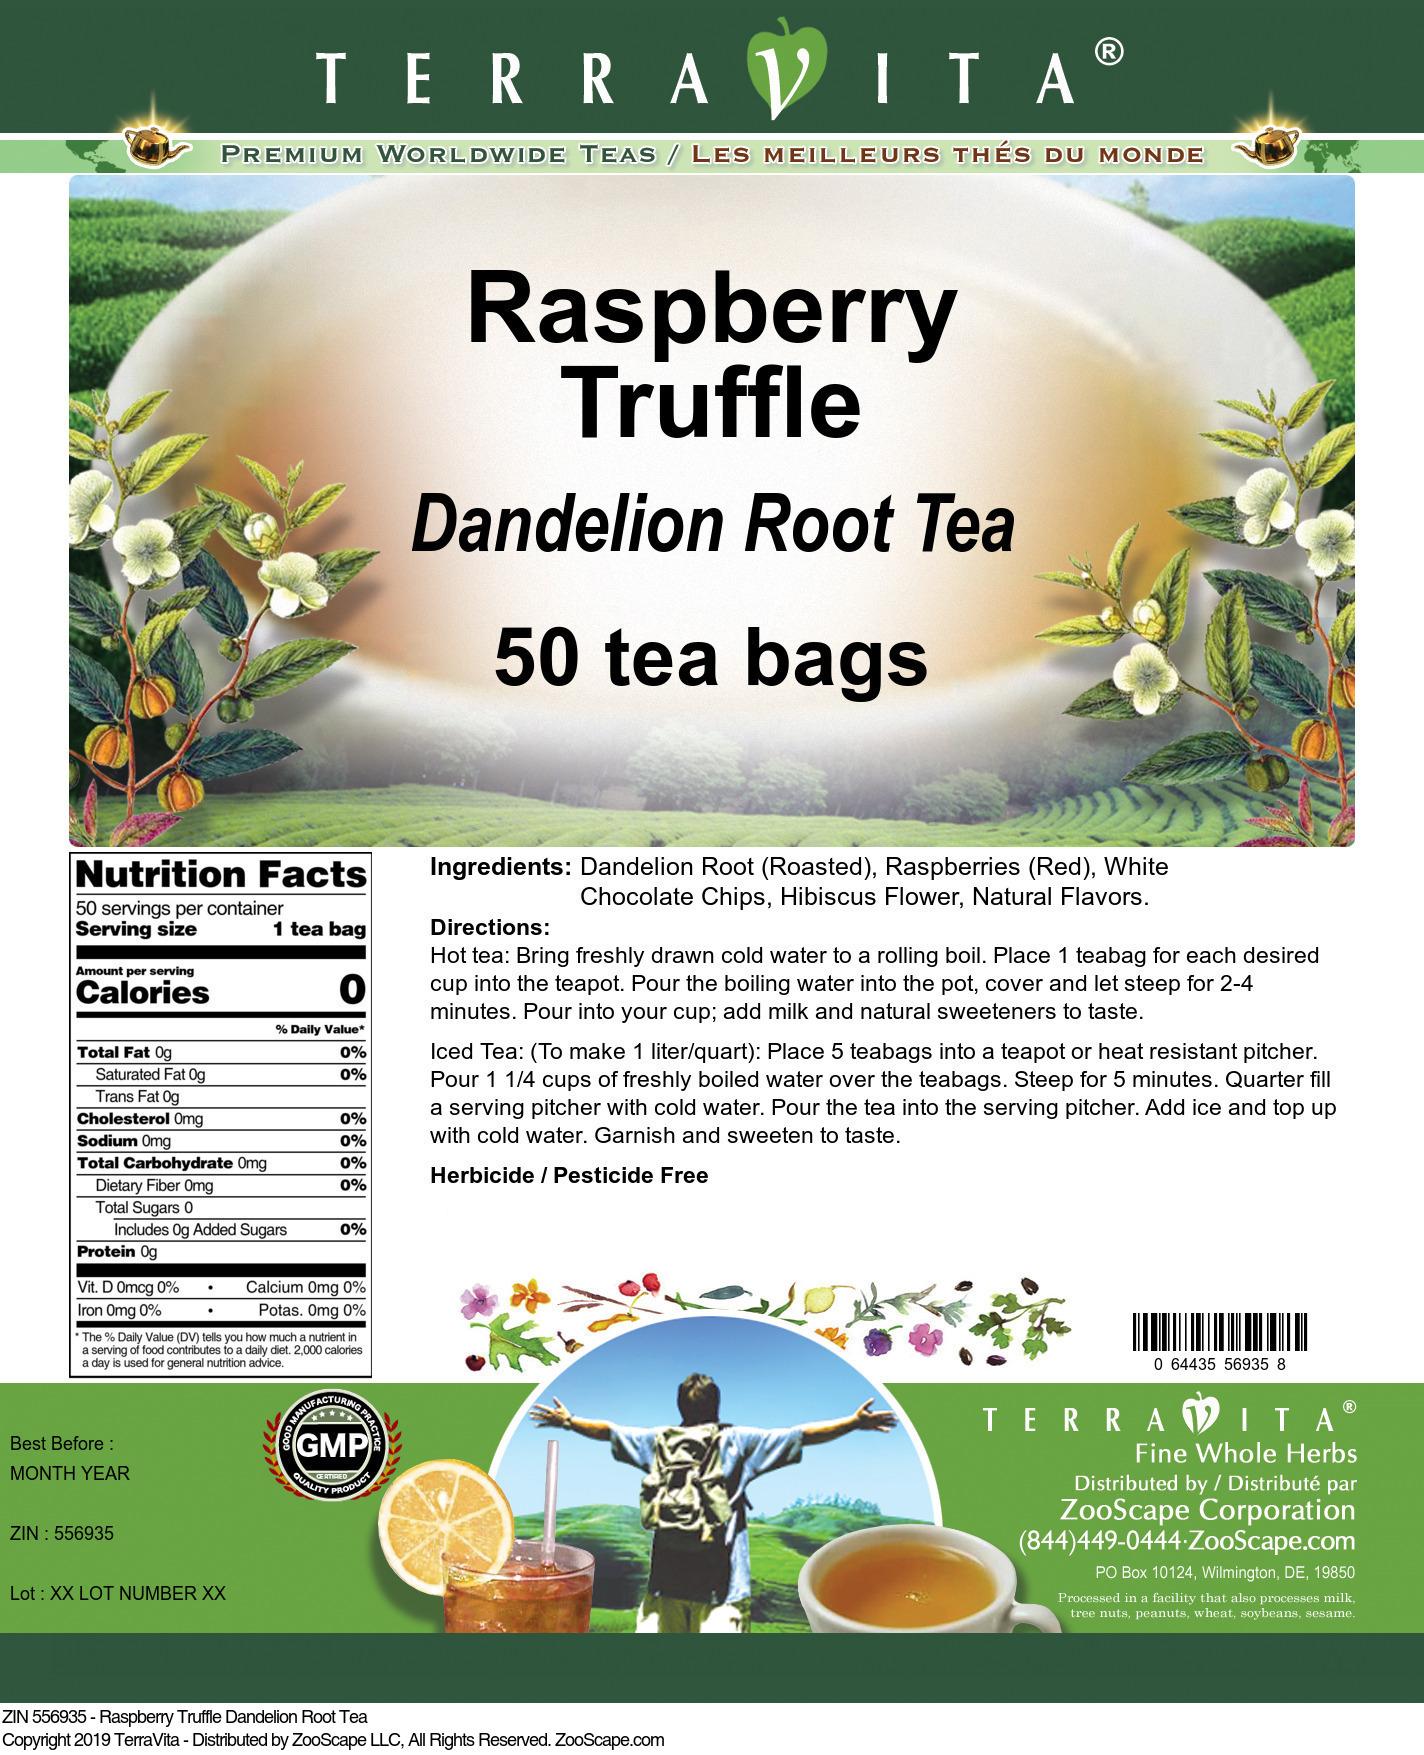 Raspberry Truffle Dandelion Root Tea